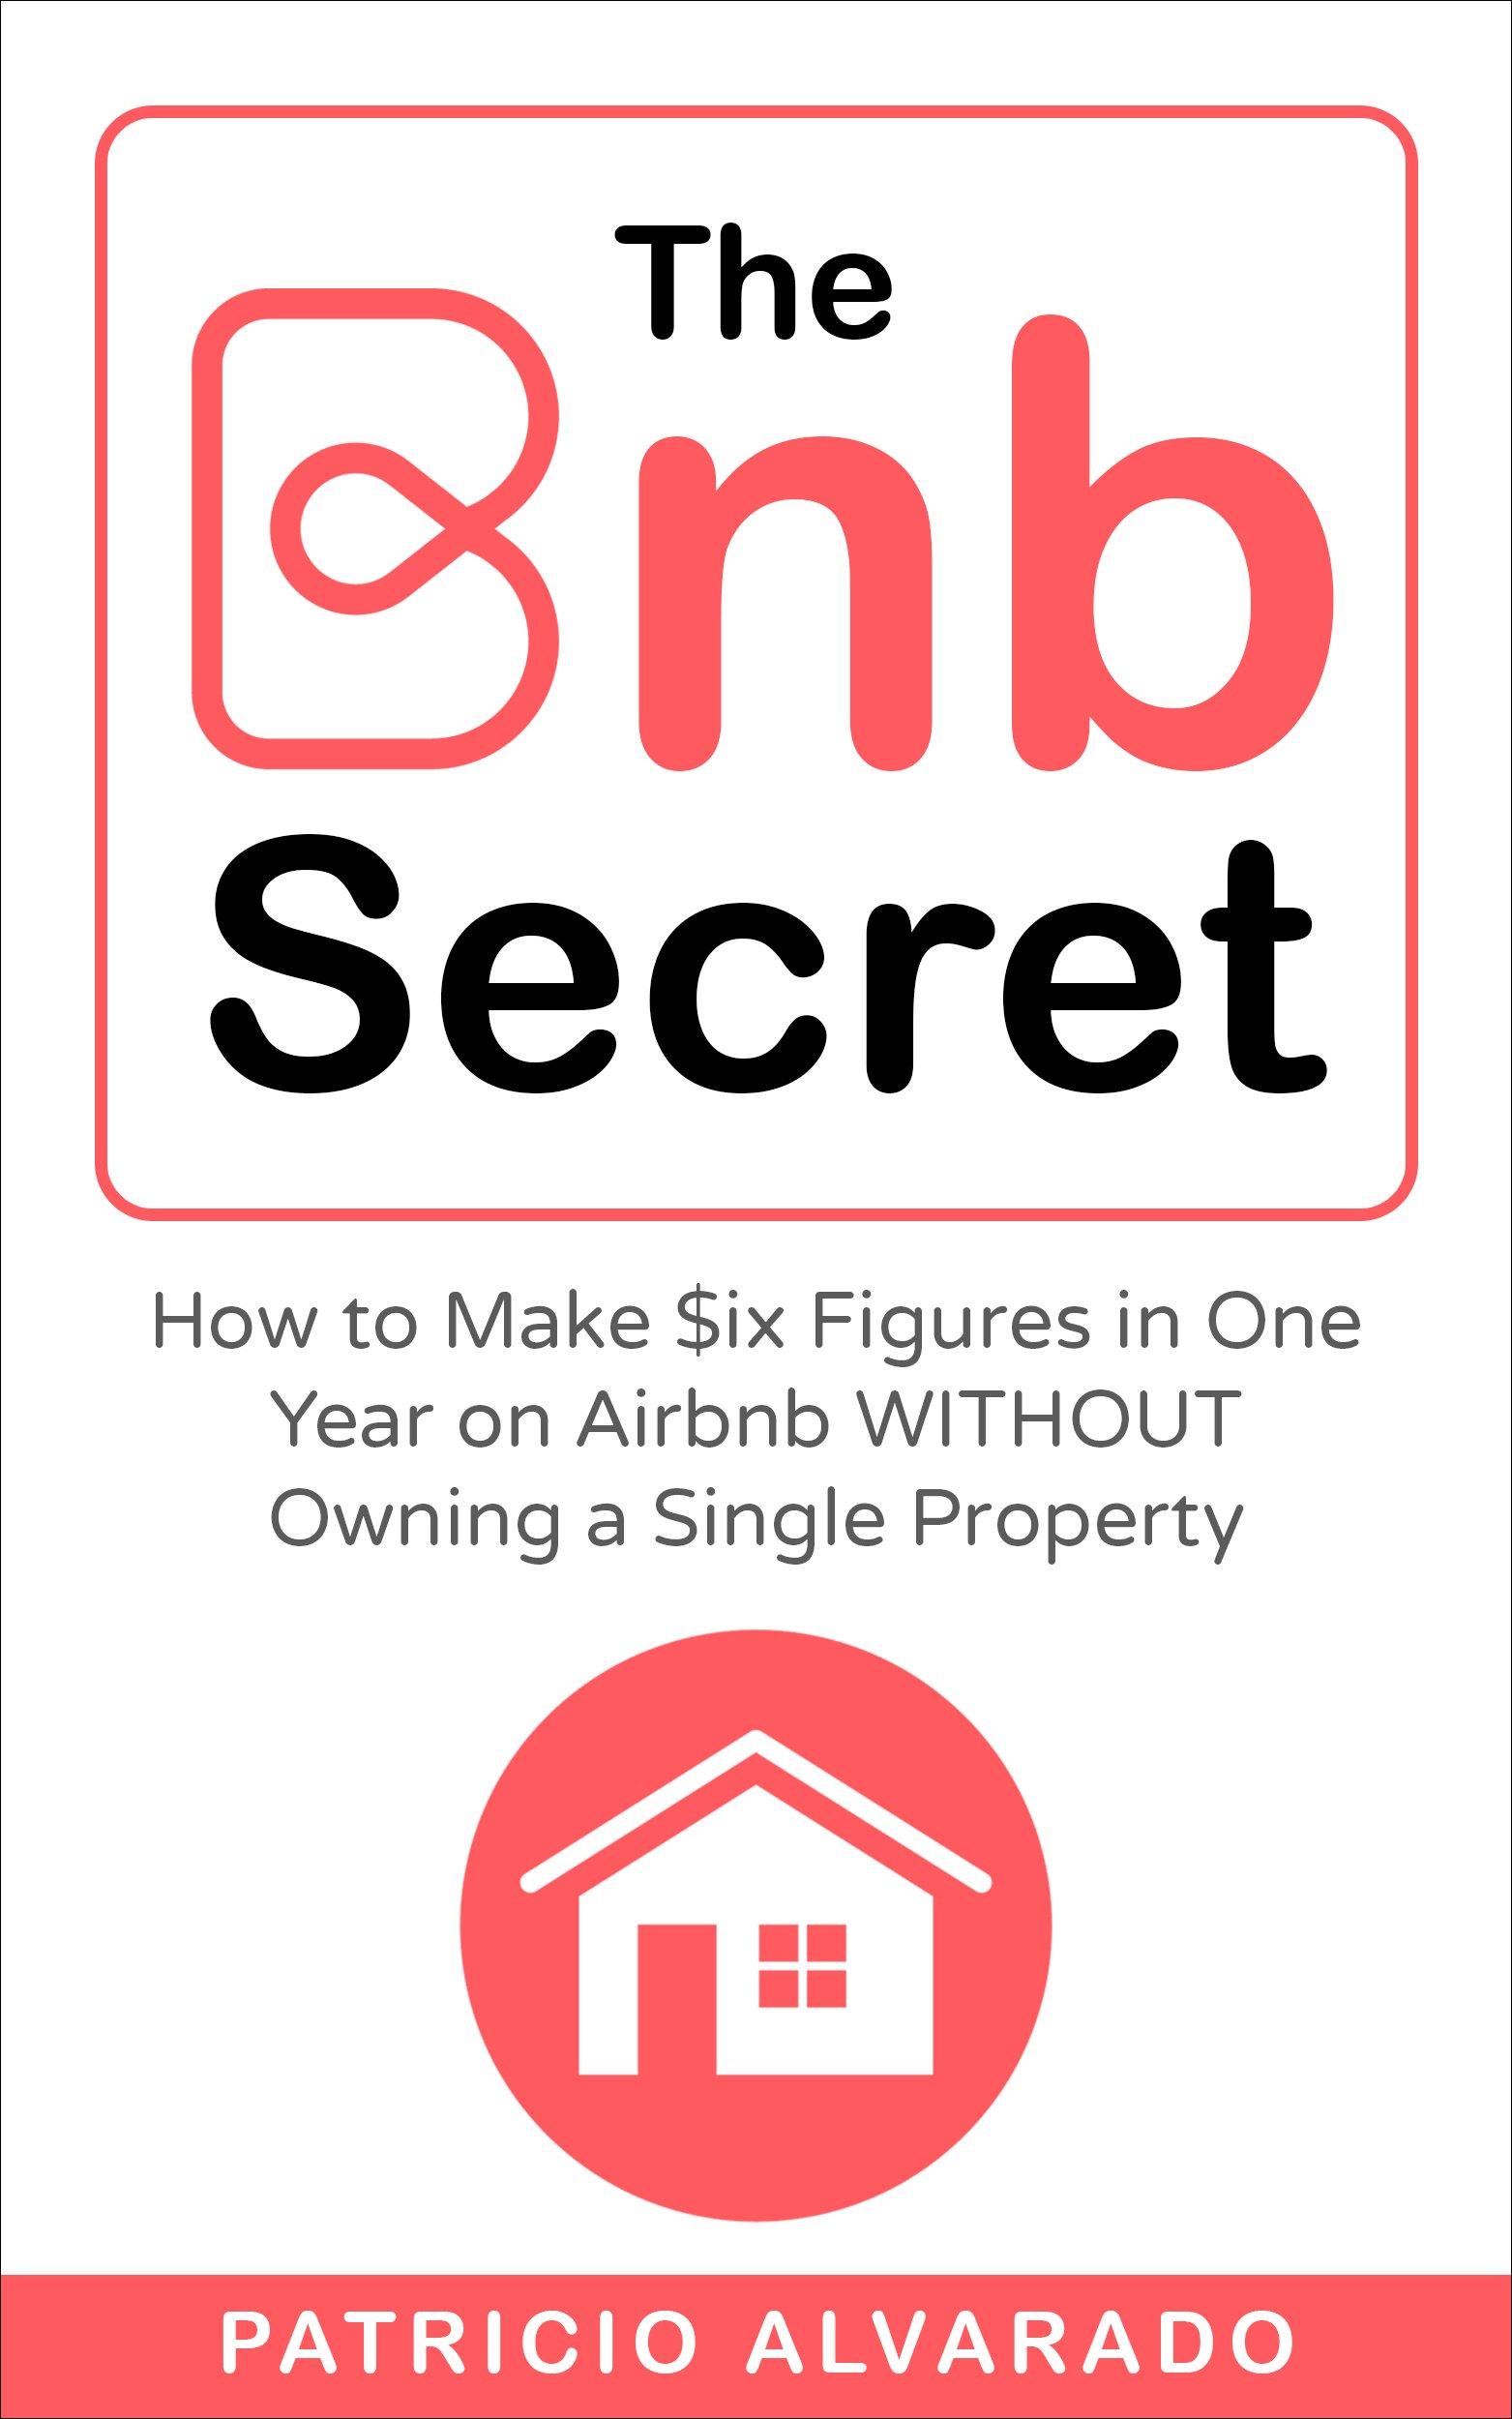 The Bnb Secret